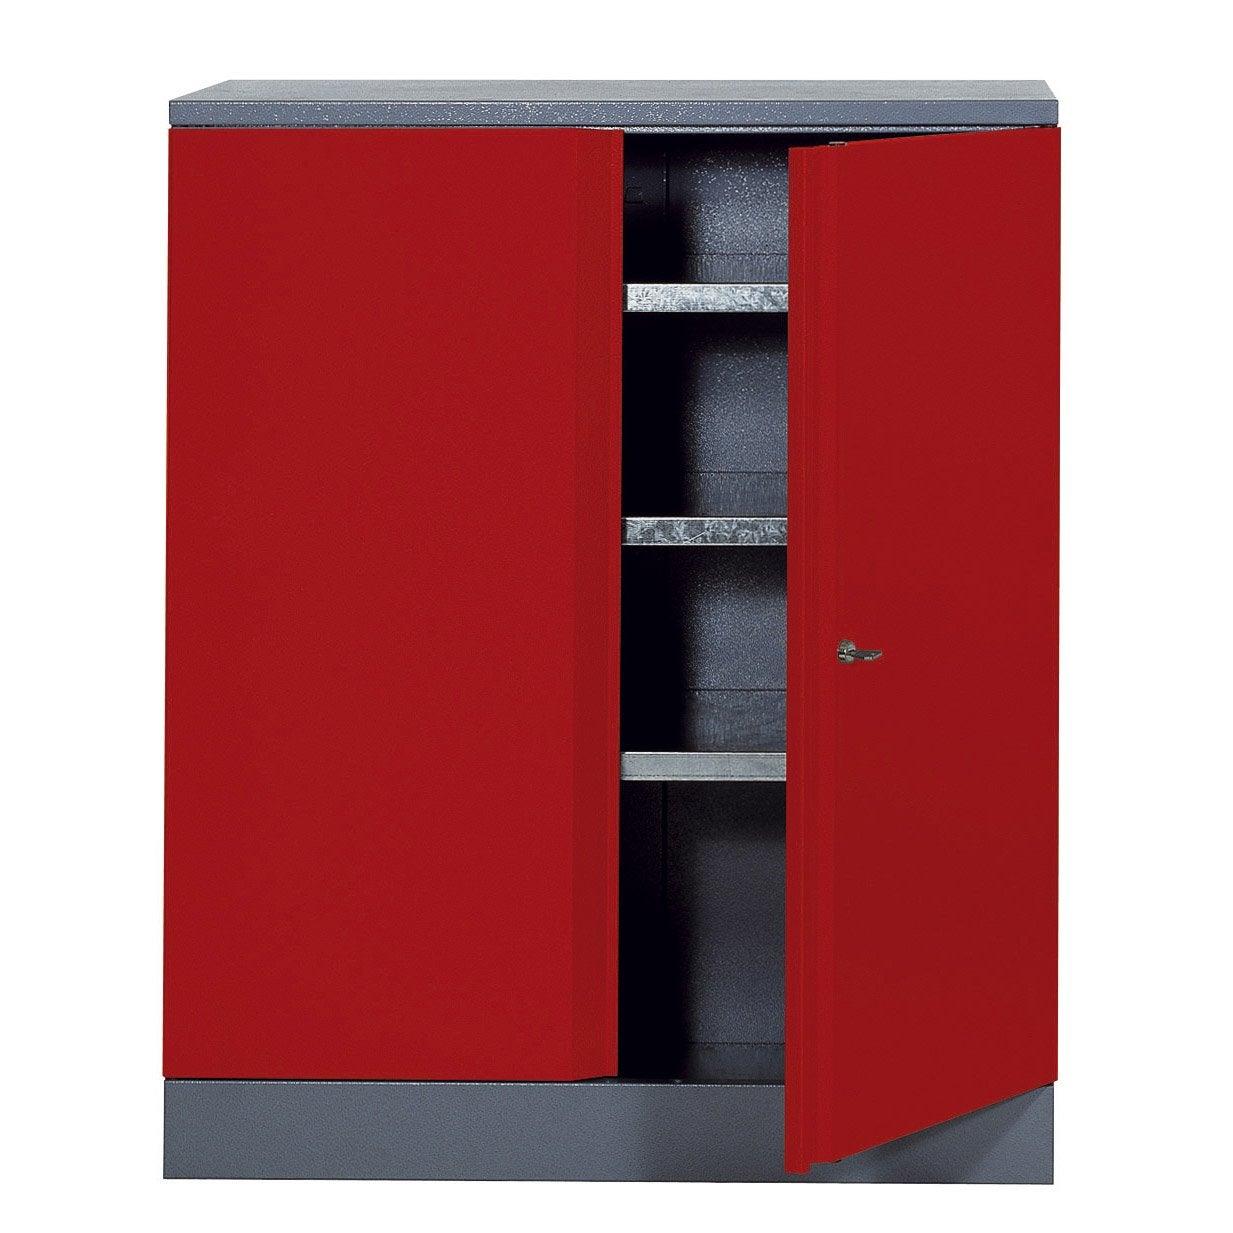 armoire de rangement en m tal rouge kupper 91 cm 1 porte leroy merlin. Black Bedroom Furniture Sets. Home Design Ideas